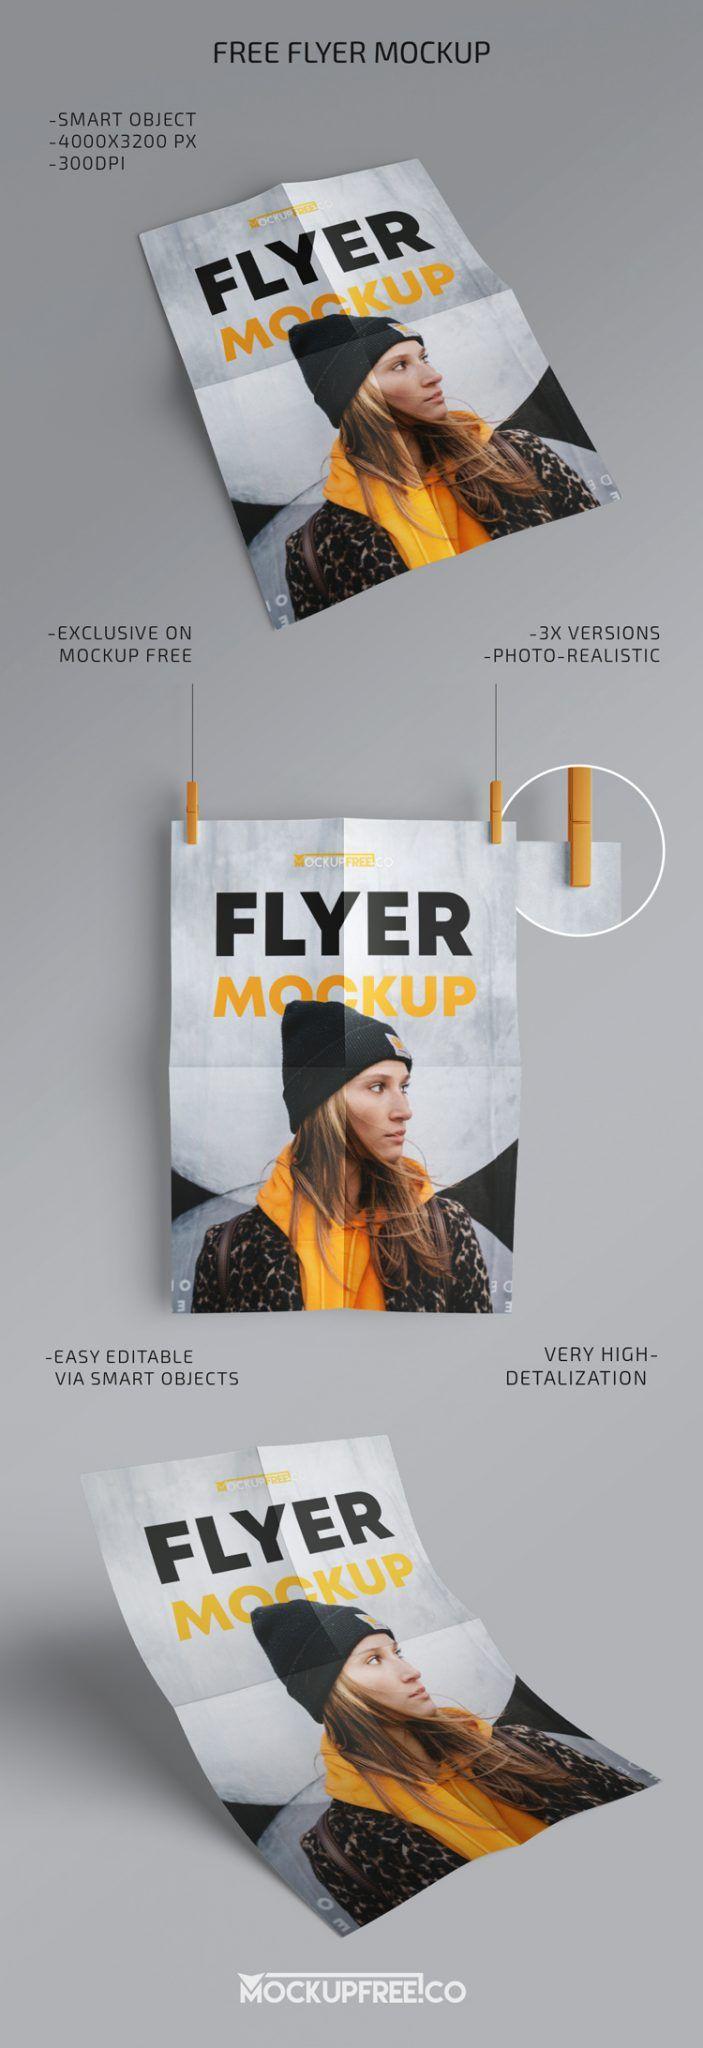 Flyer 3 Free Psd Mockups Mockupfree Co Mockup Free Psd Flyer Poster Template Free